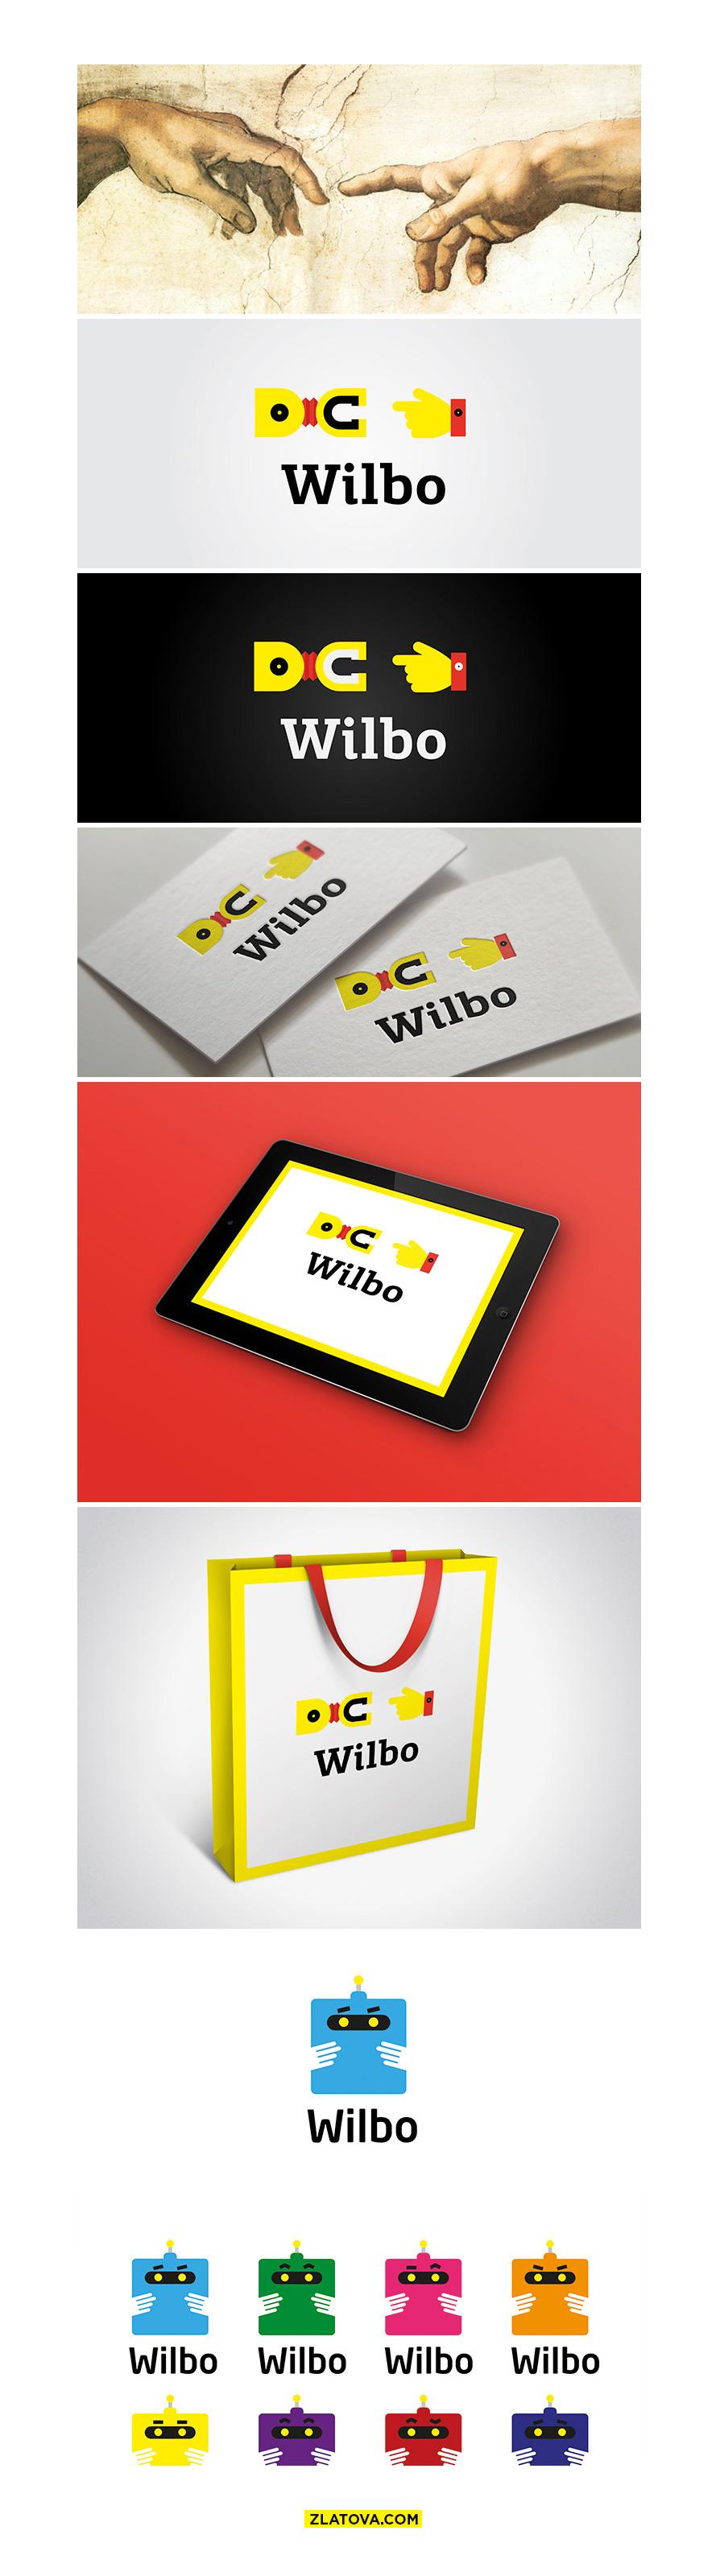 Wilbo